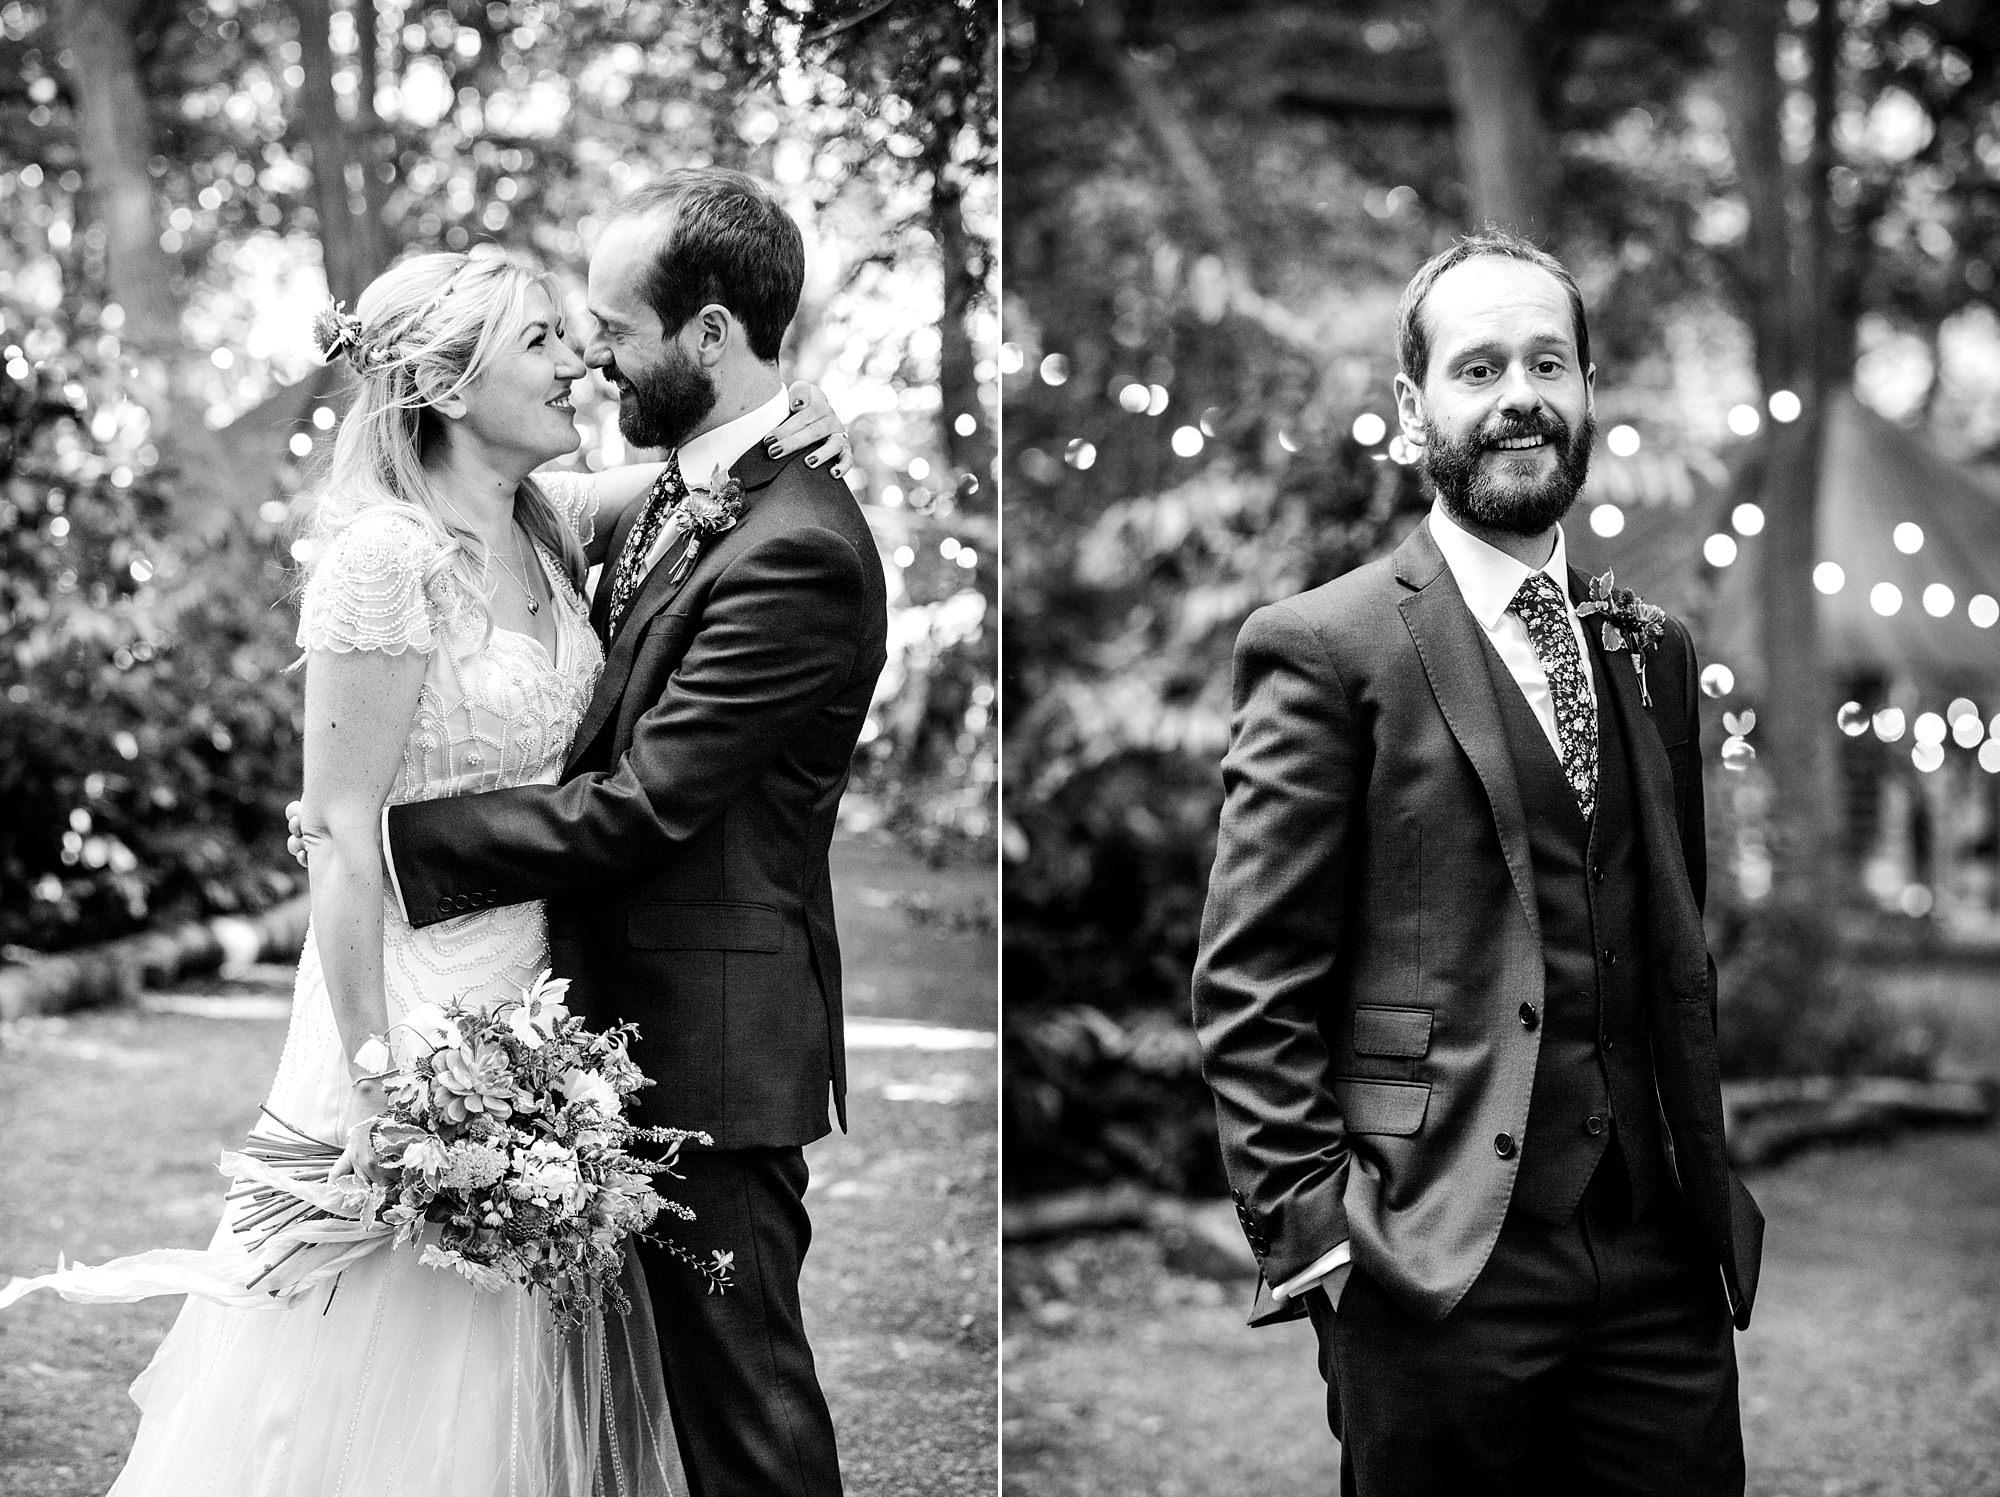 Woodland Weddings Tring bride and groom portrait